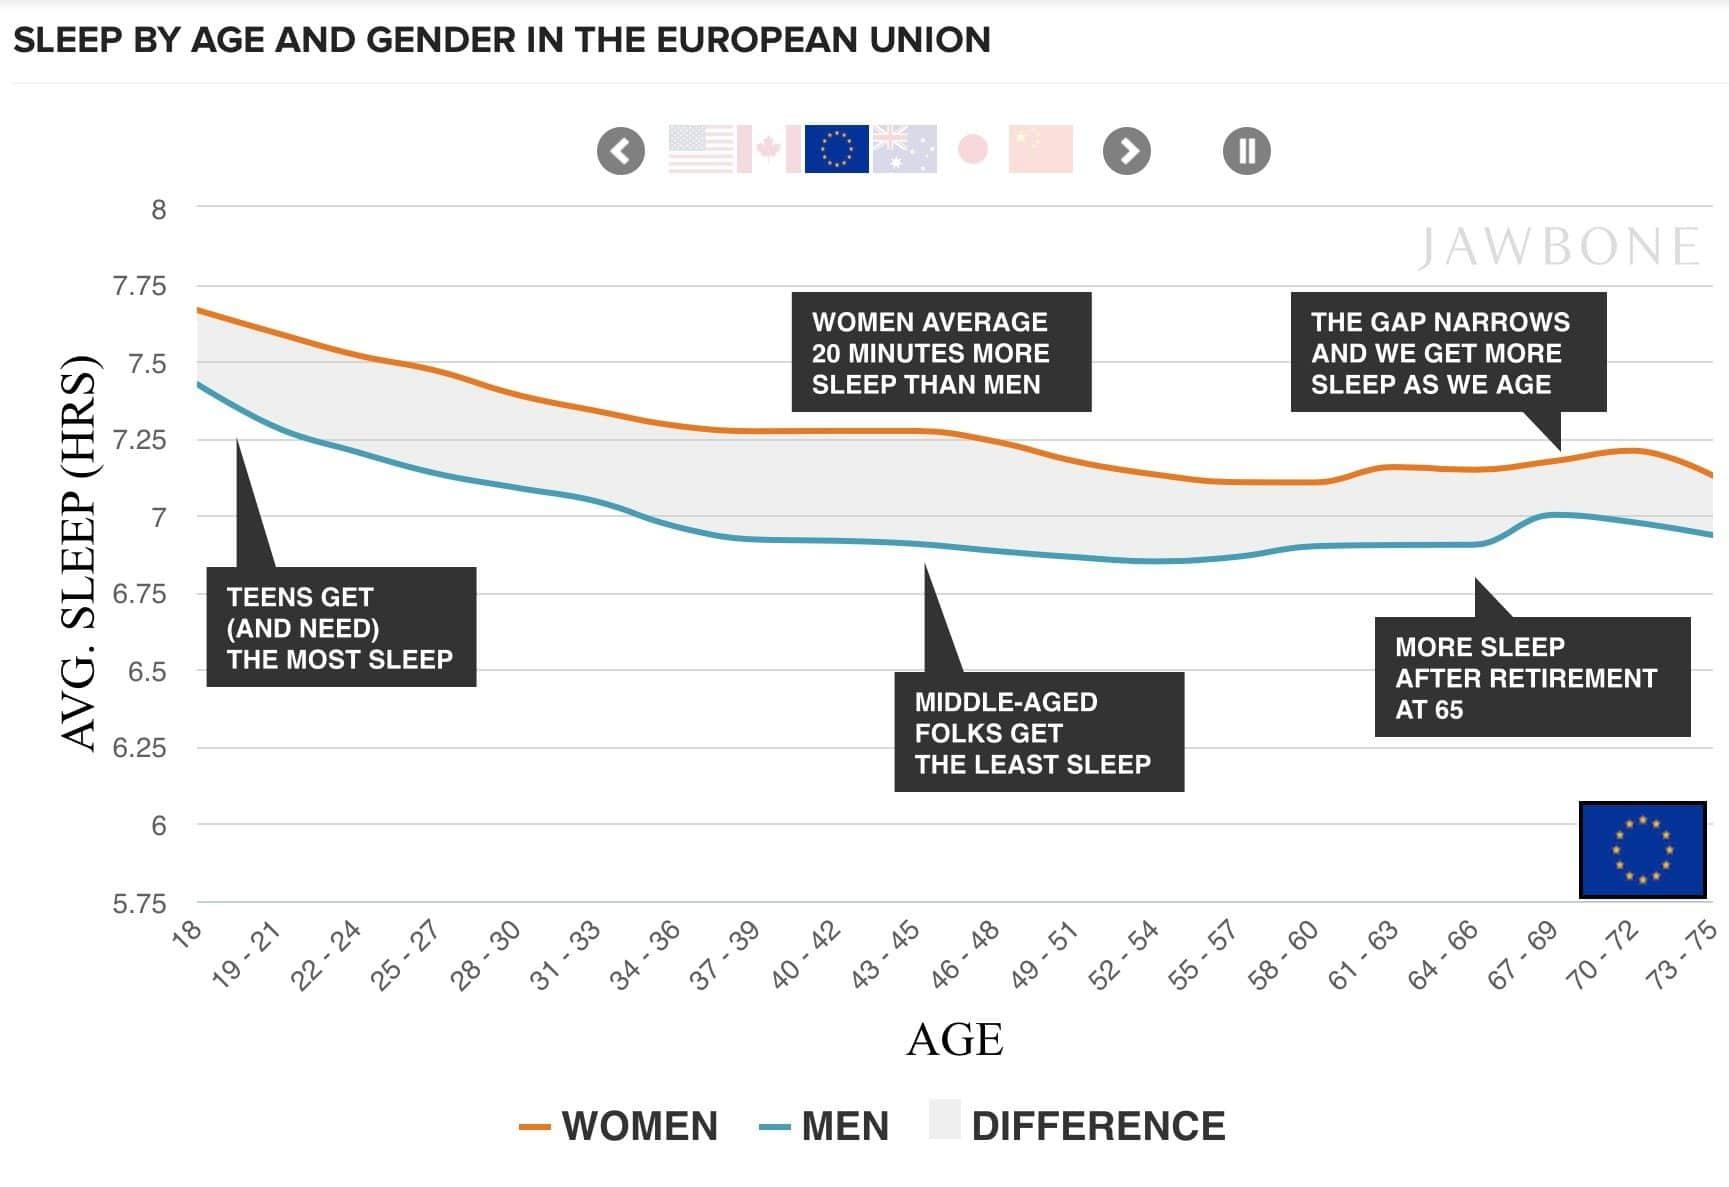 who gets more sleep men or women jawbone crunches the data 2 - Who gets more sleep - men or women? Jawbone crunches the data.